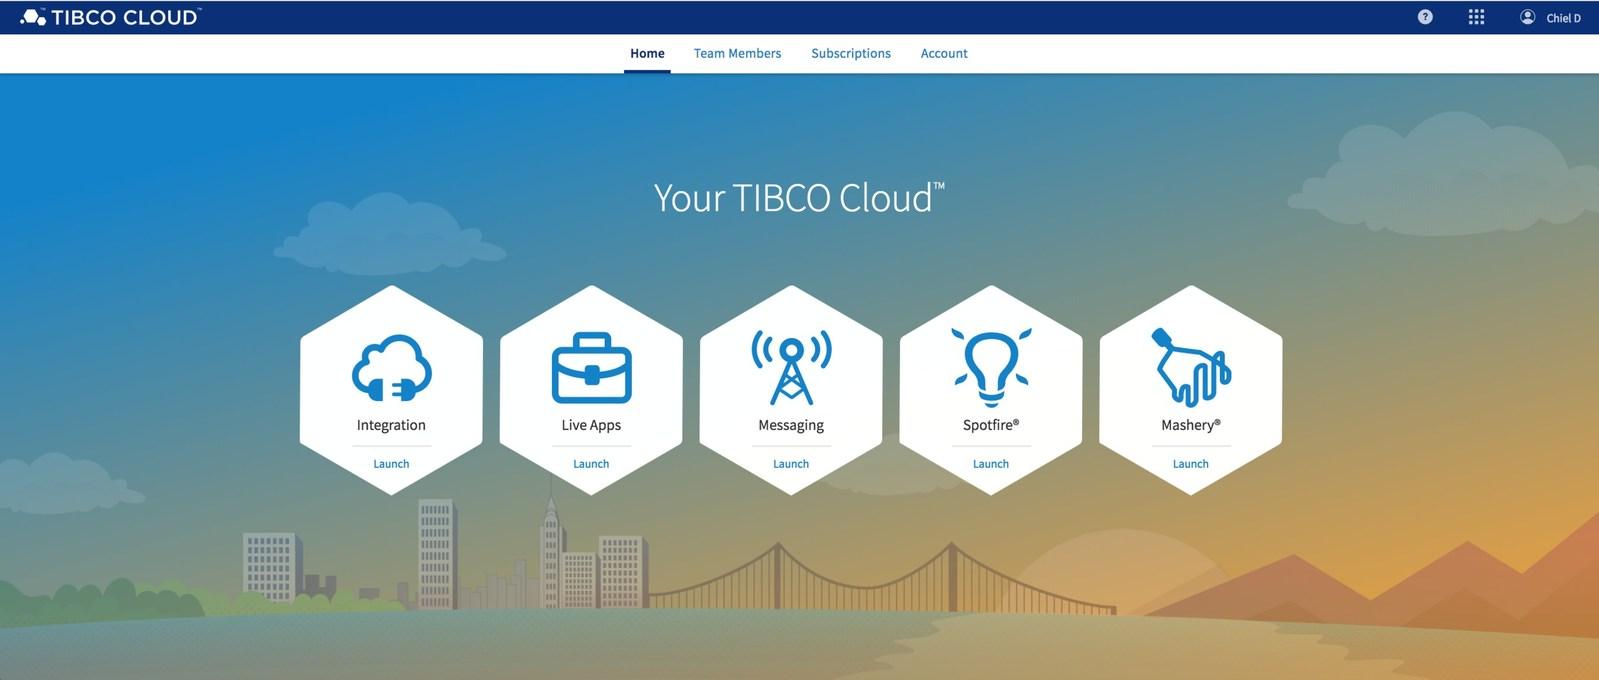 TIBCO Software Named a Leader in Gartner's 2018 Magic Quadrant